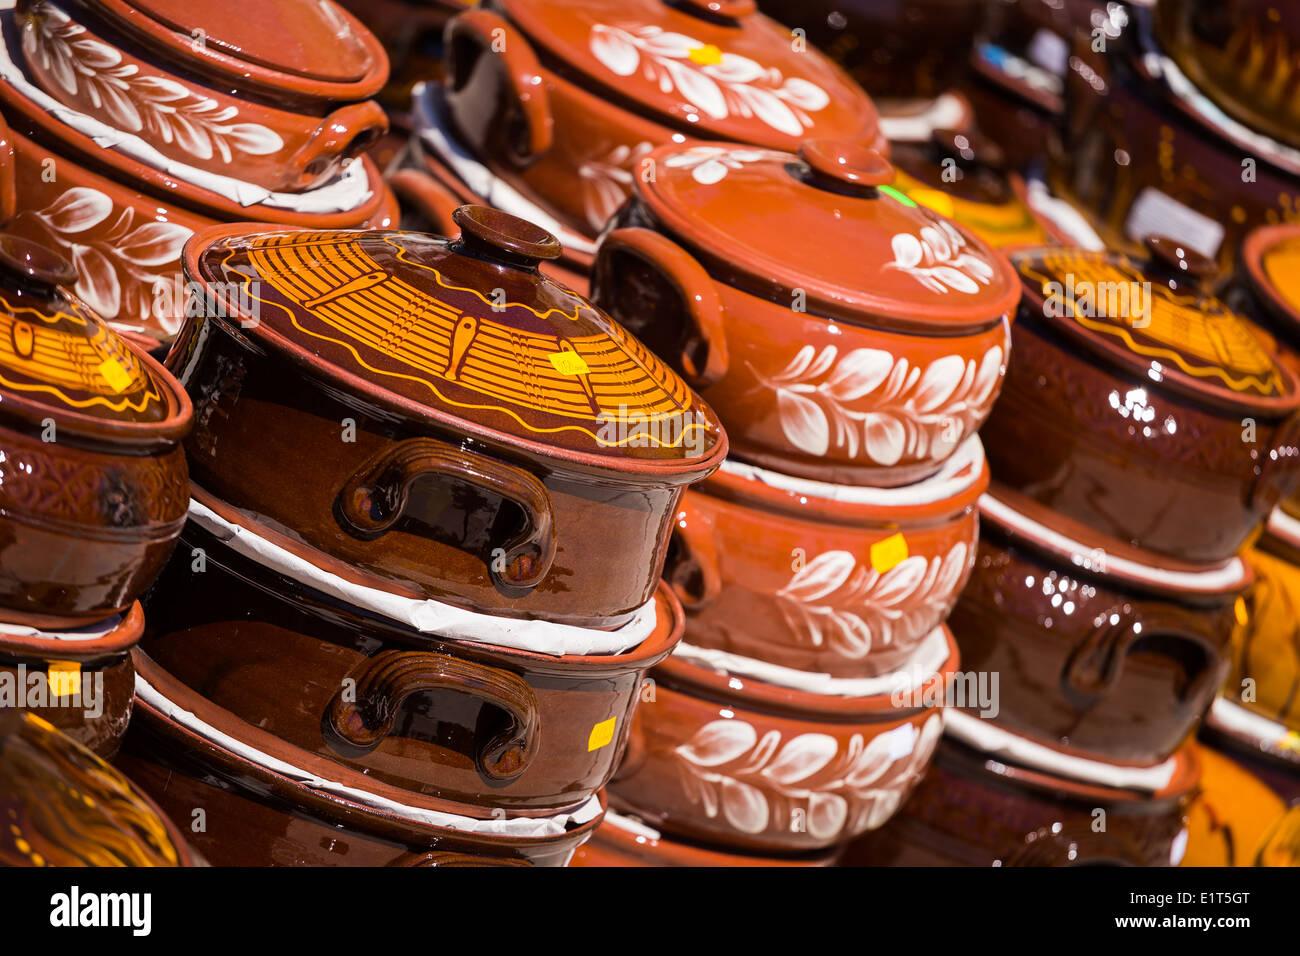 earthenware pottery on sale during the sudamja celebrations in split croatia - Stock Image